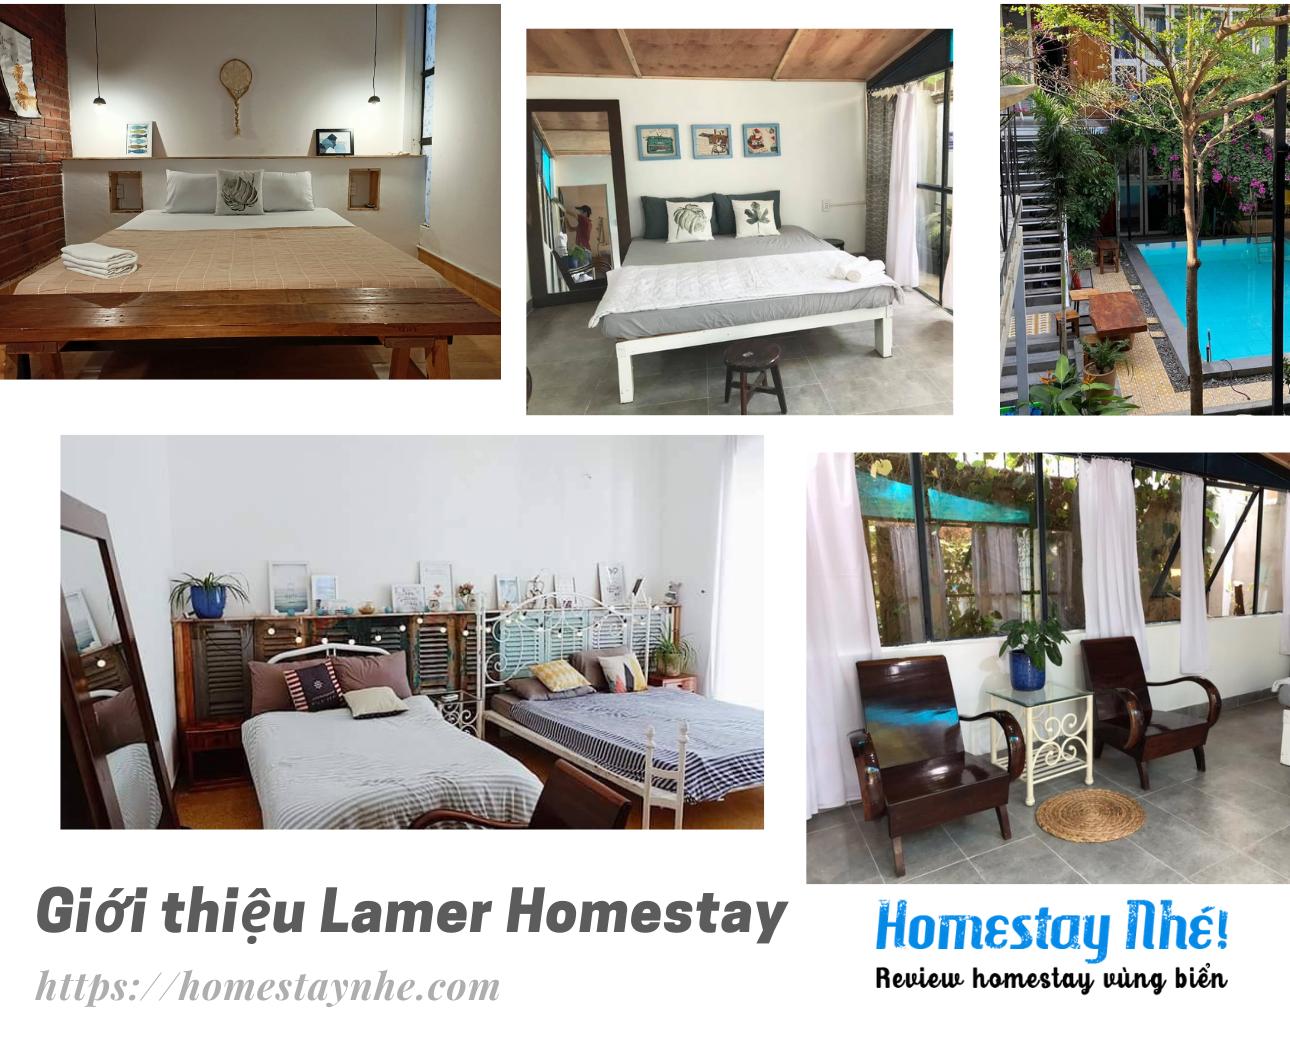 Giới thiệu Lamer Homestay